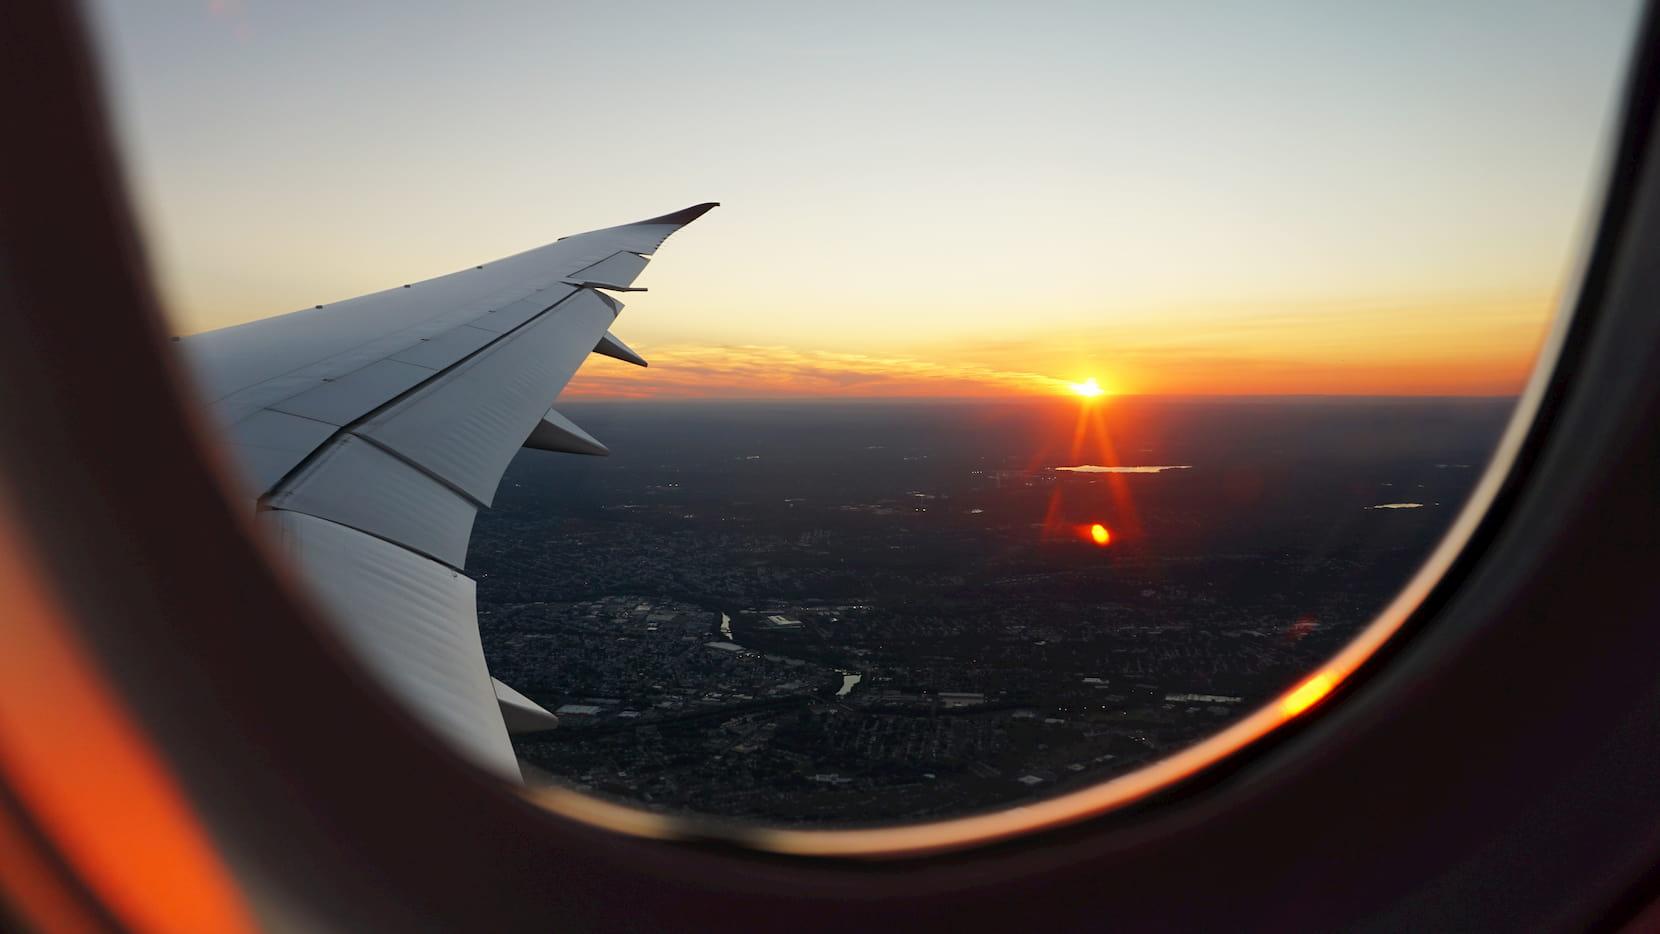 Wish&Fly: Oh sorpresa ¡Te vas de viaje!